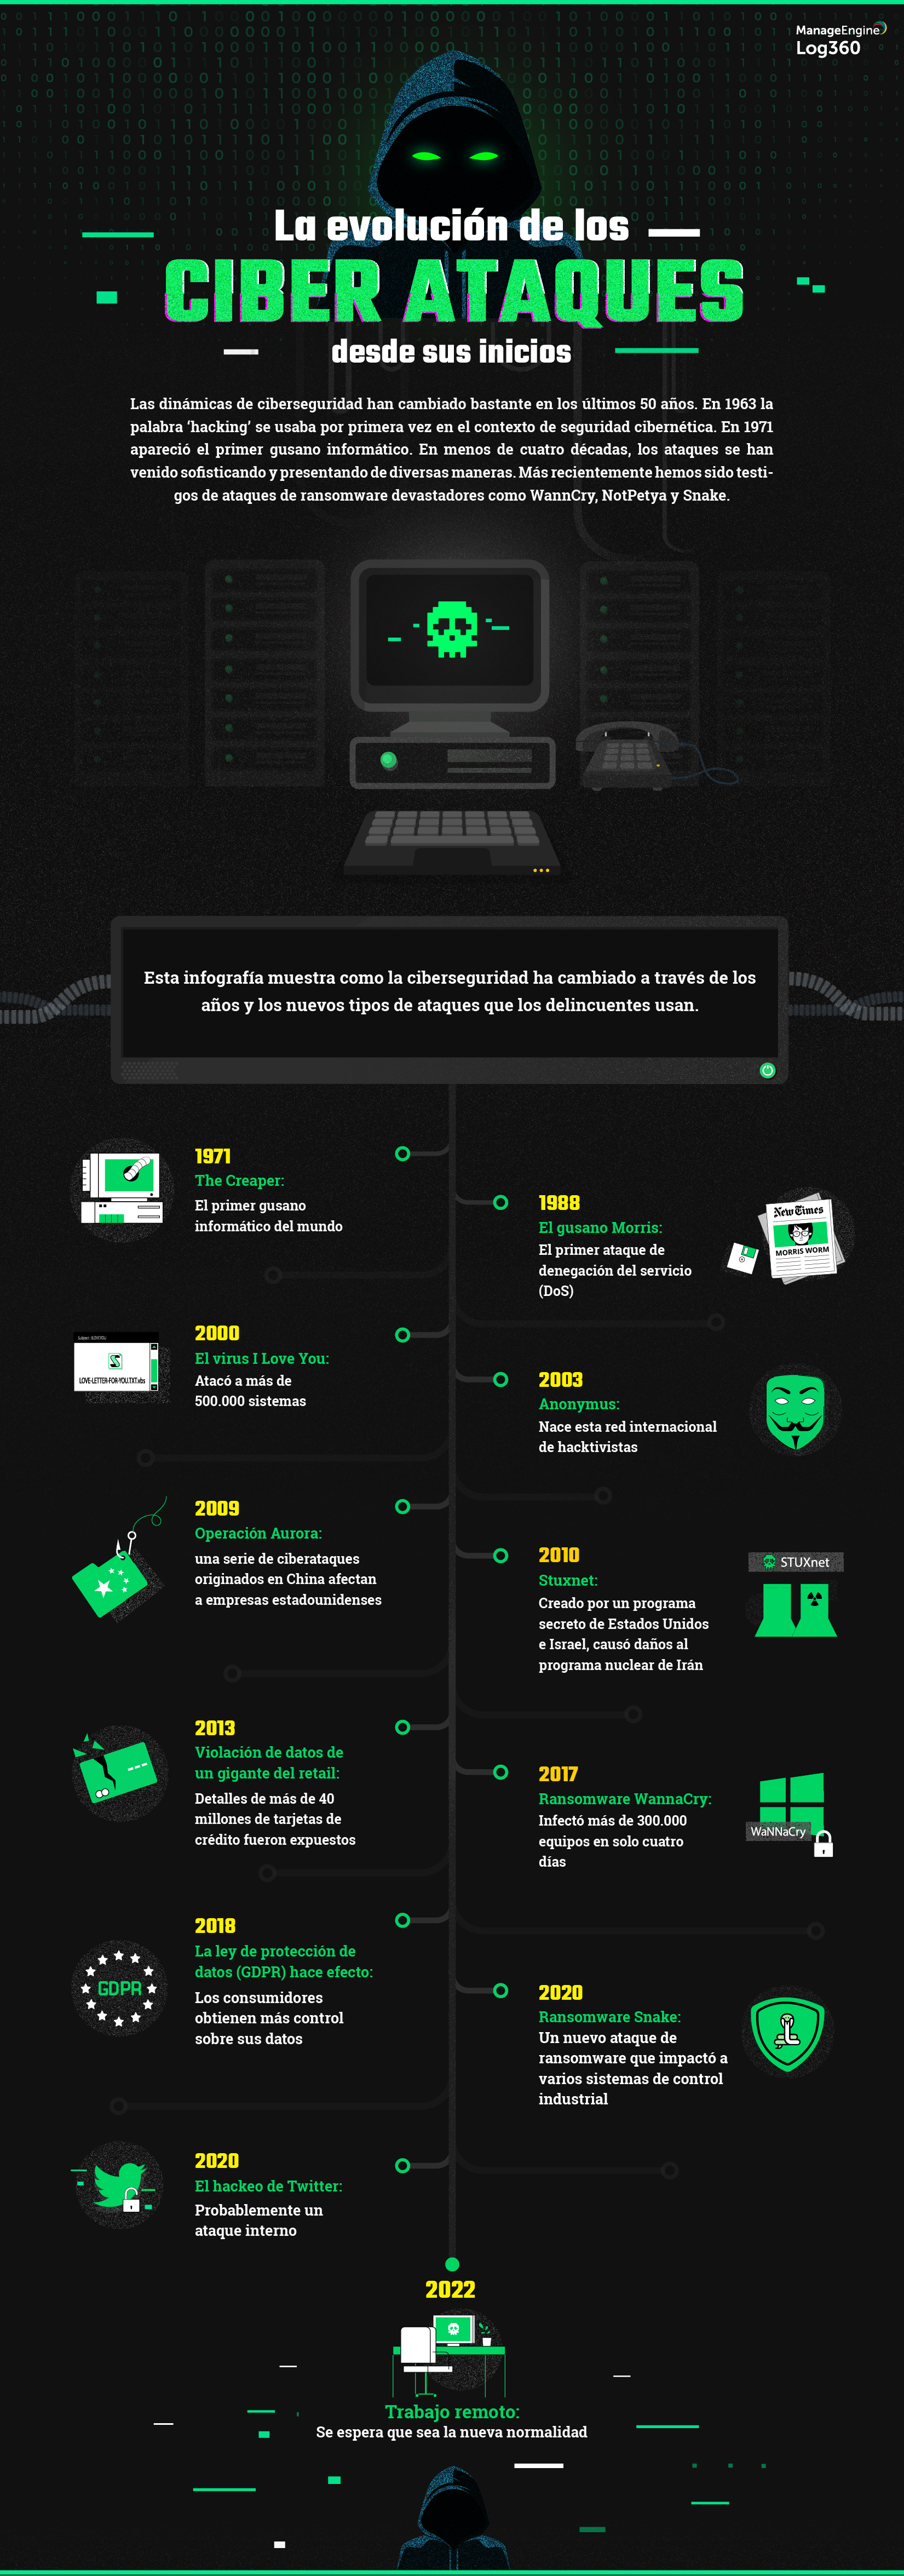 The evolution of cyberattacks